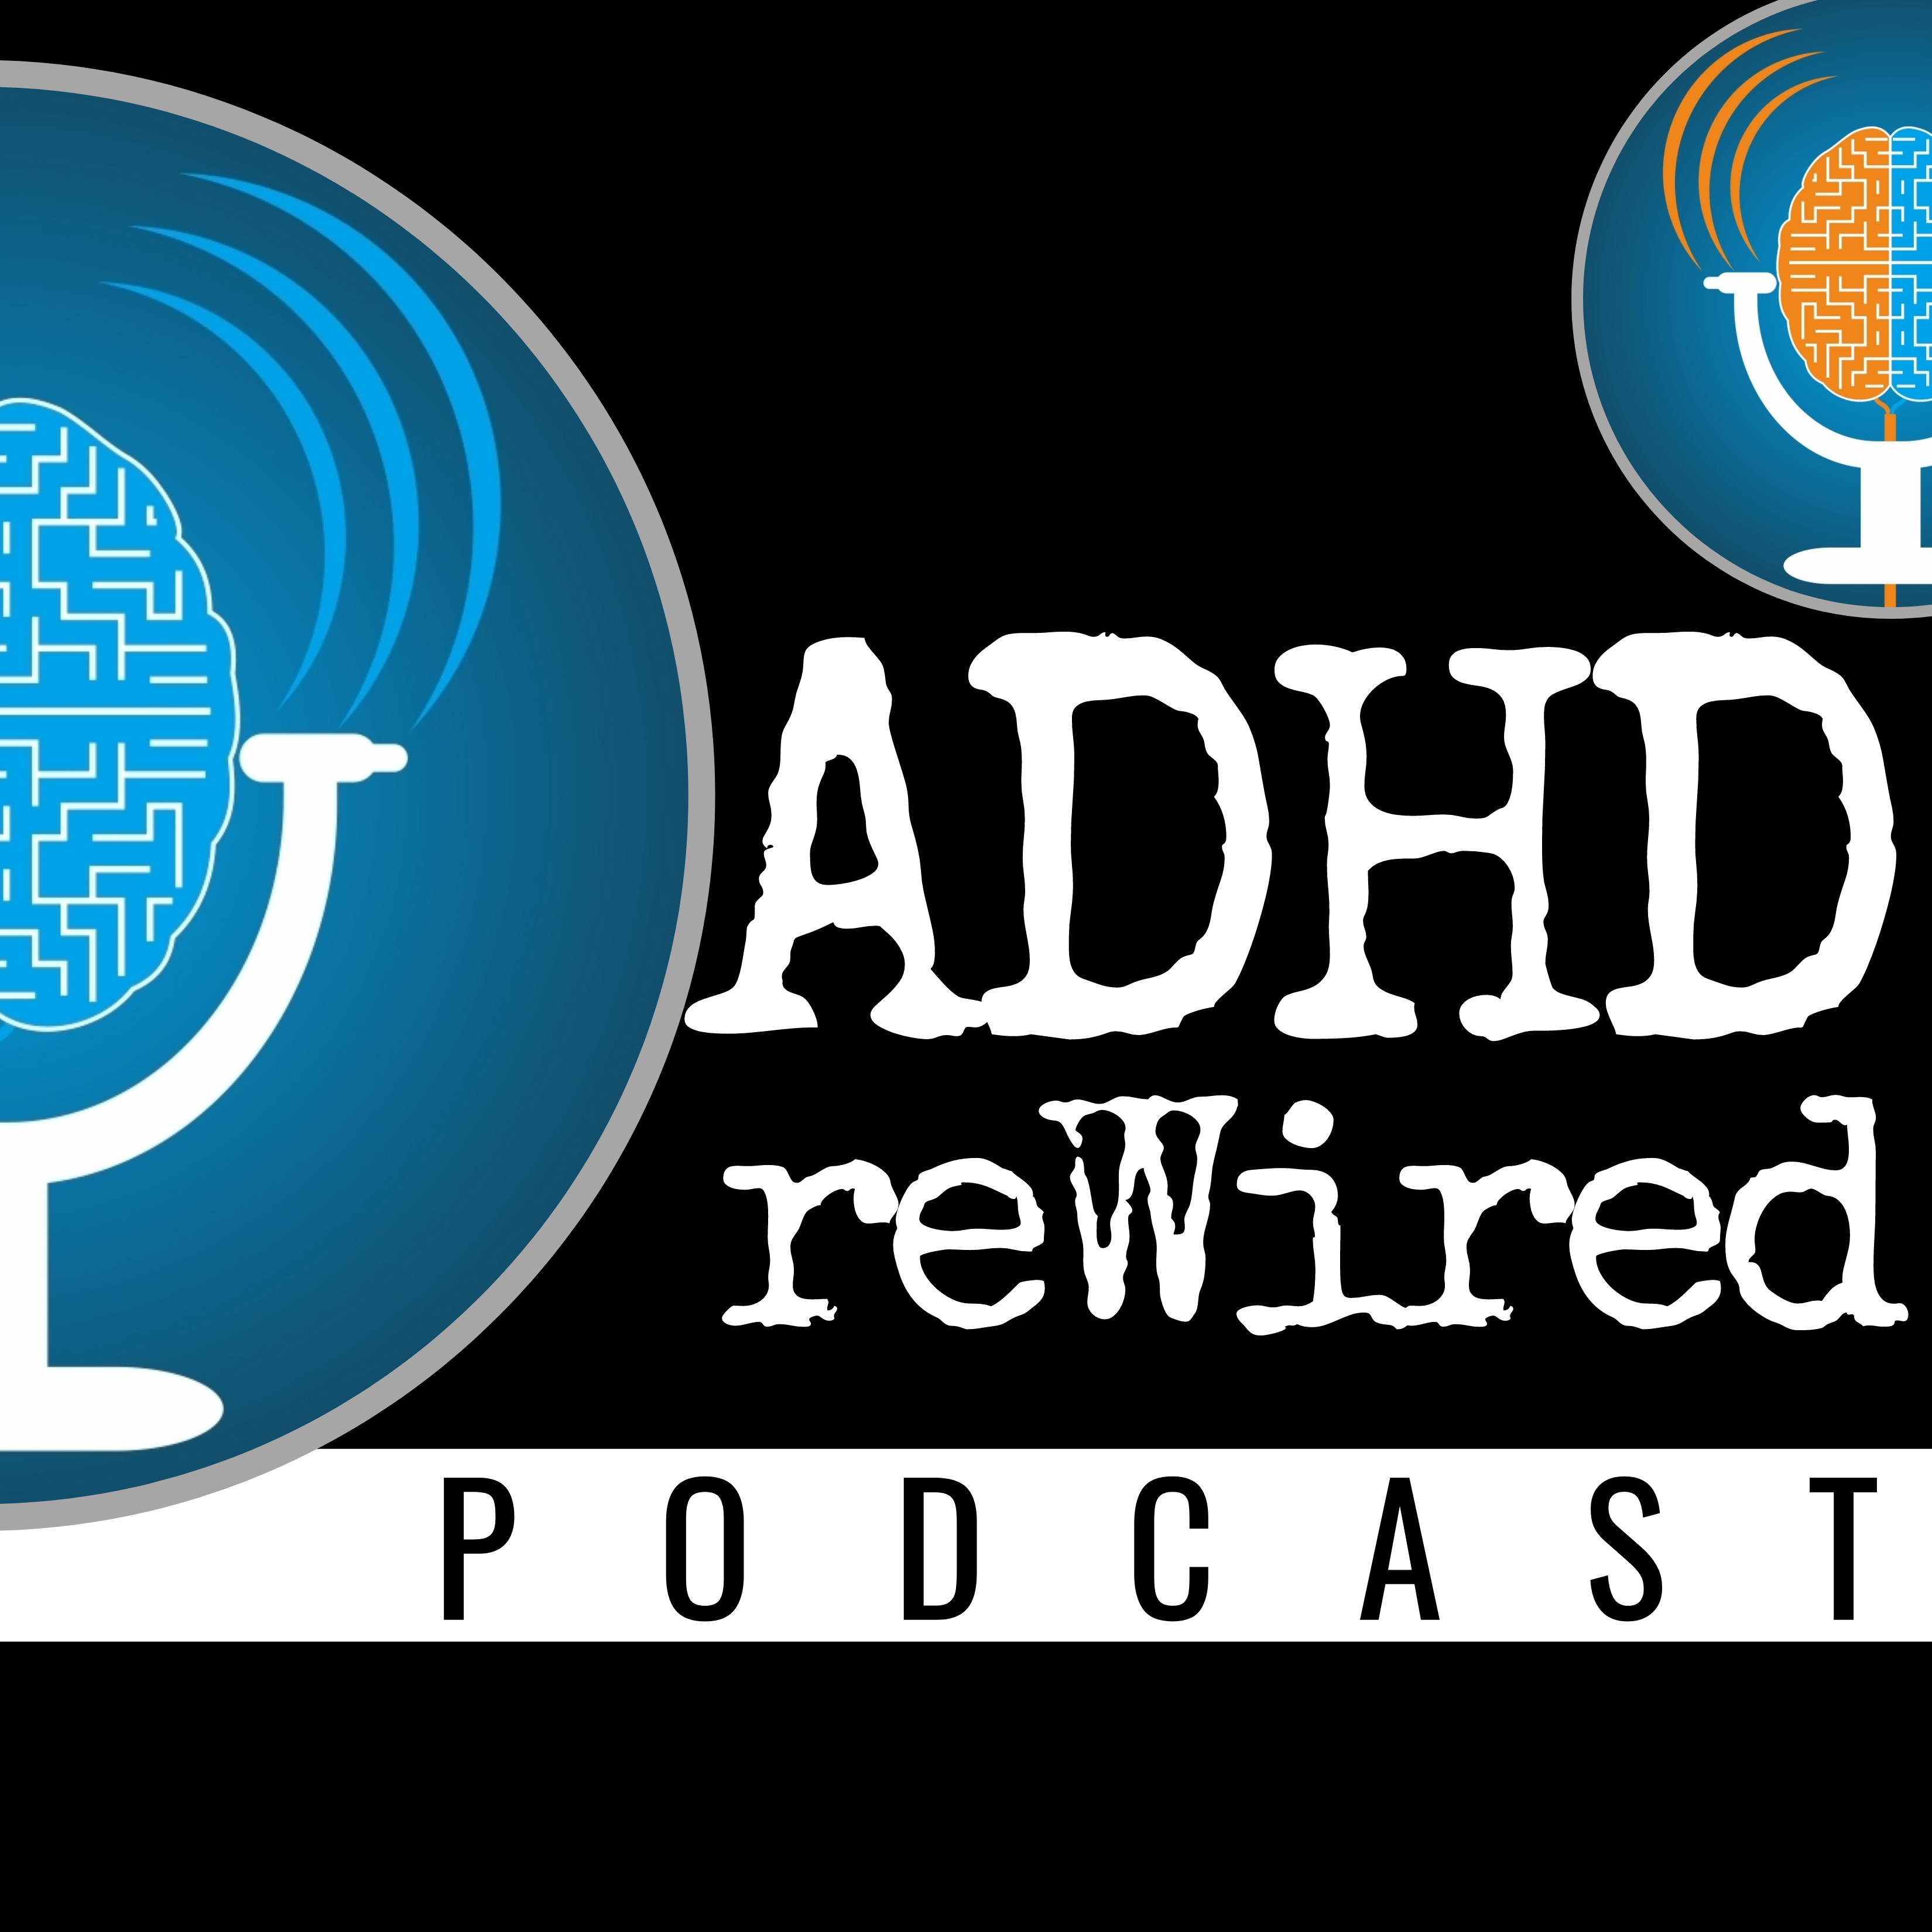 ADHD reWired show art